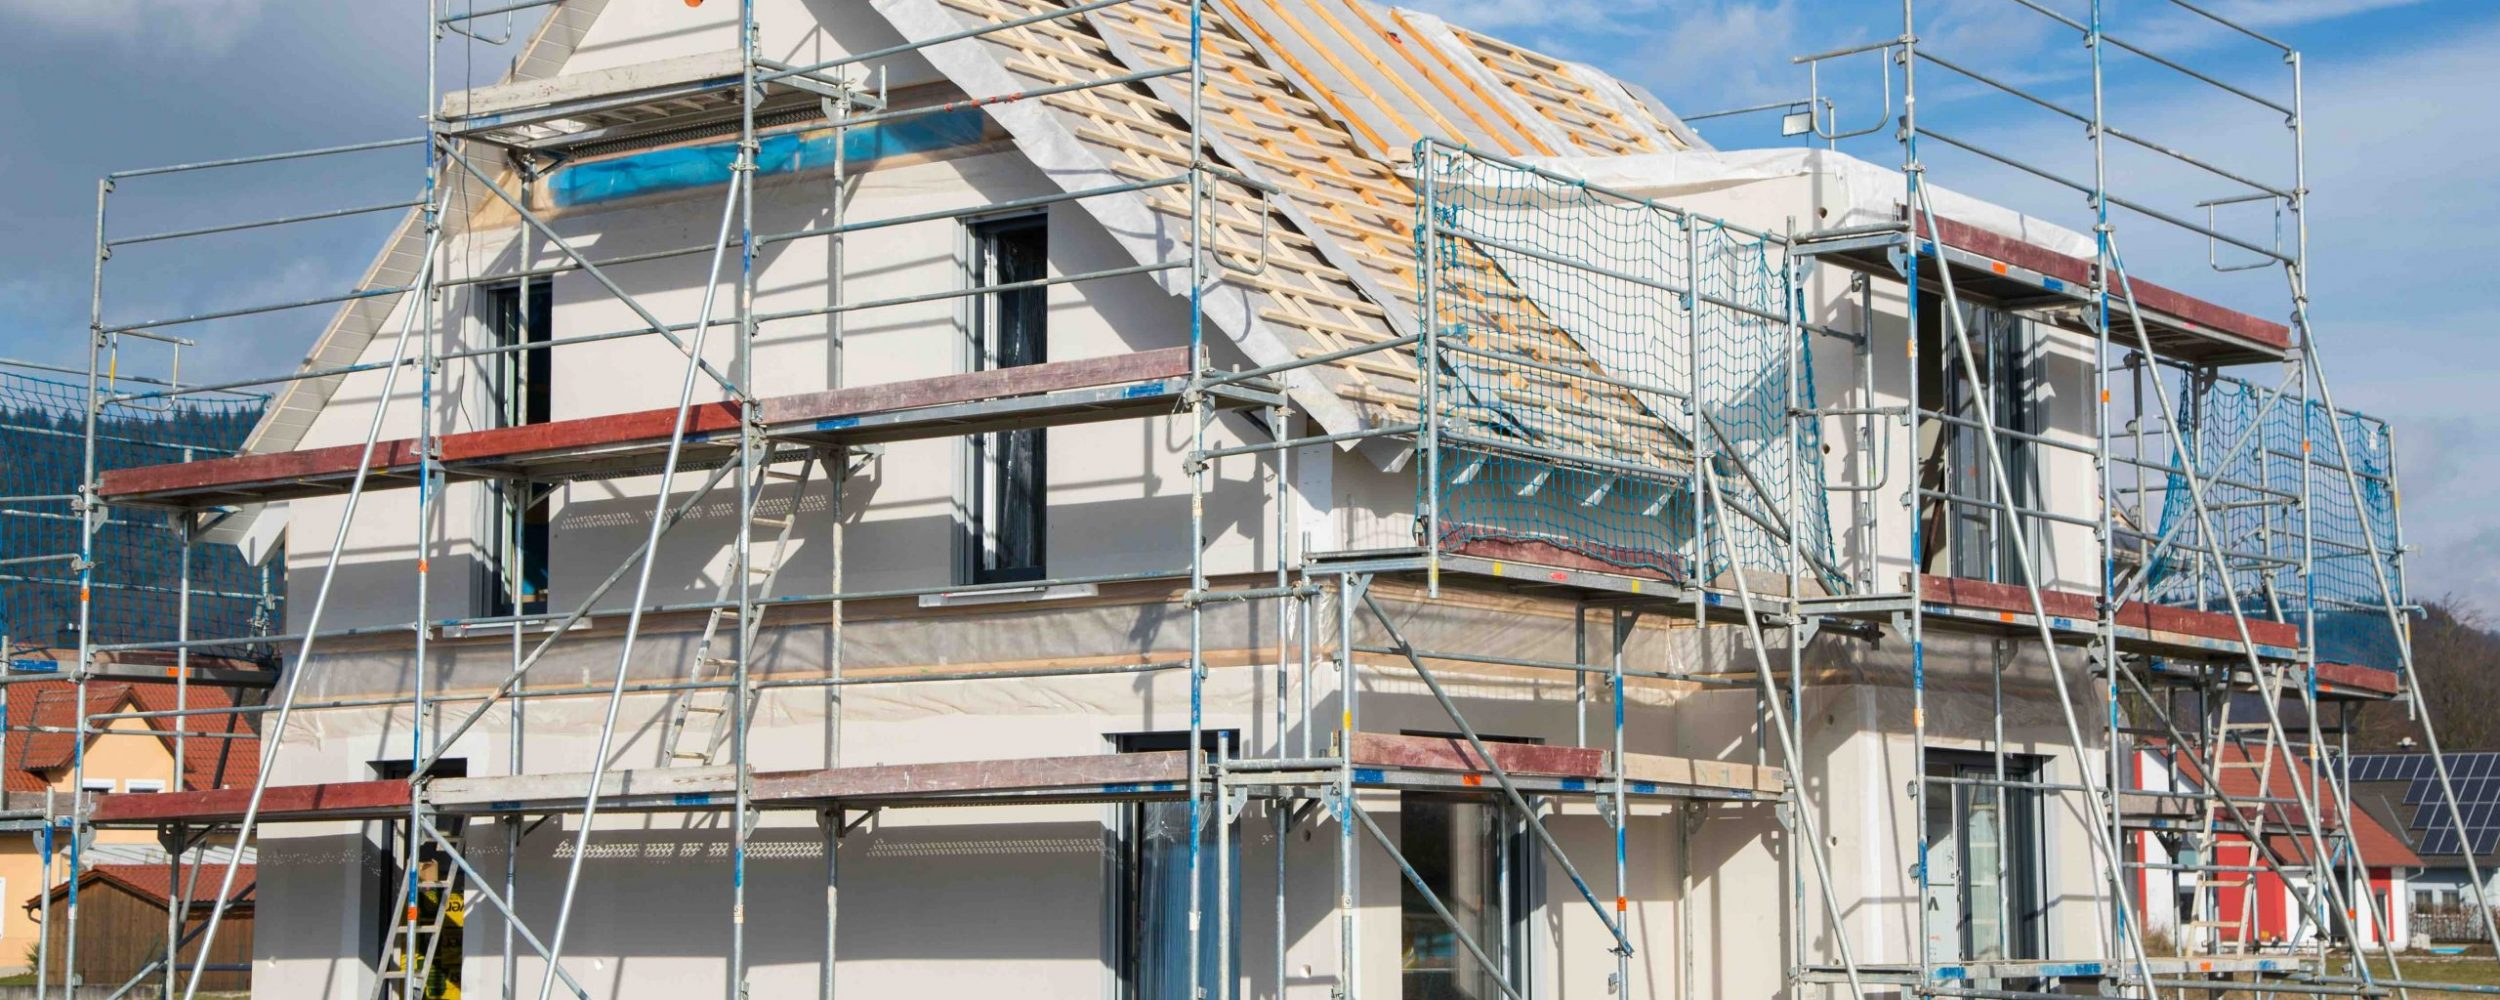 Baustelle: Neubau eines Einfamilienhauses